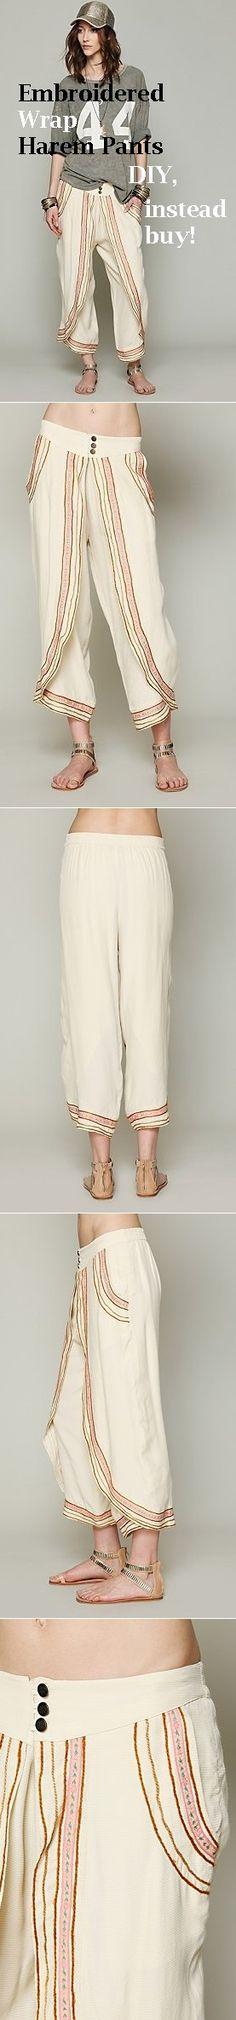 Idea - Embroidered Wrap Harem Pants DIY, Instead Buy!